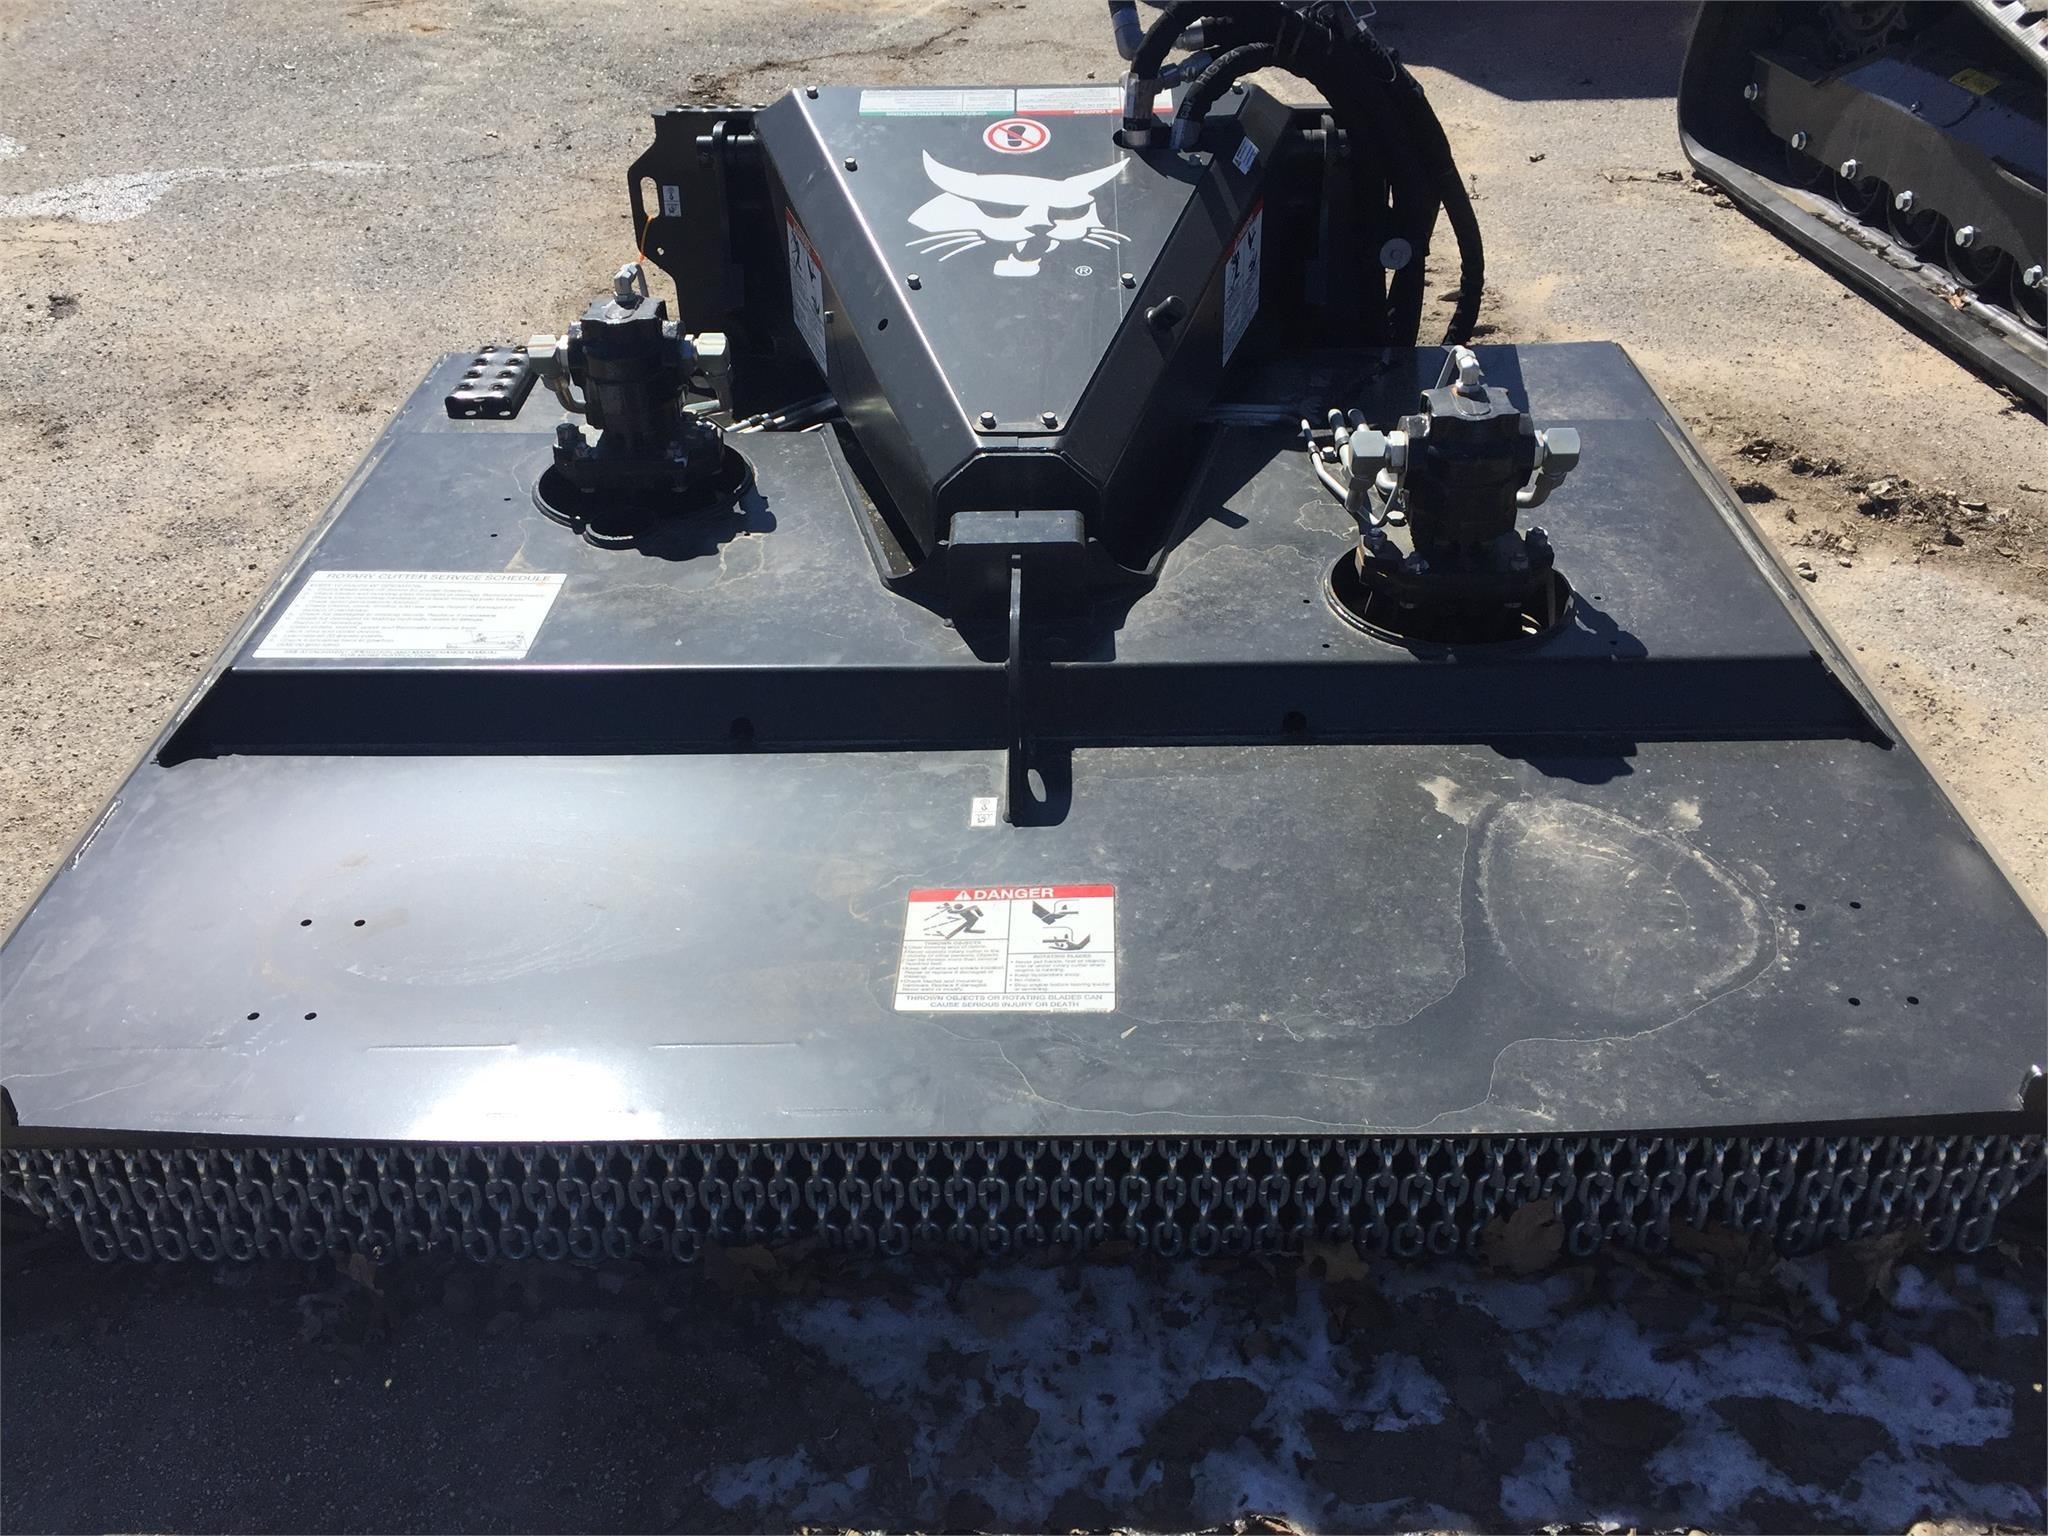 2021 Bobcat BRUSHCAT 80RC HF Loader and Skid Steer Attachment